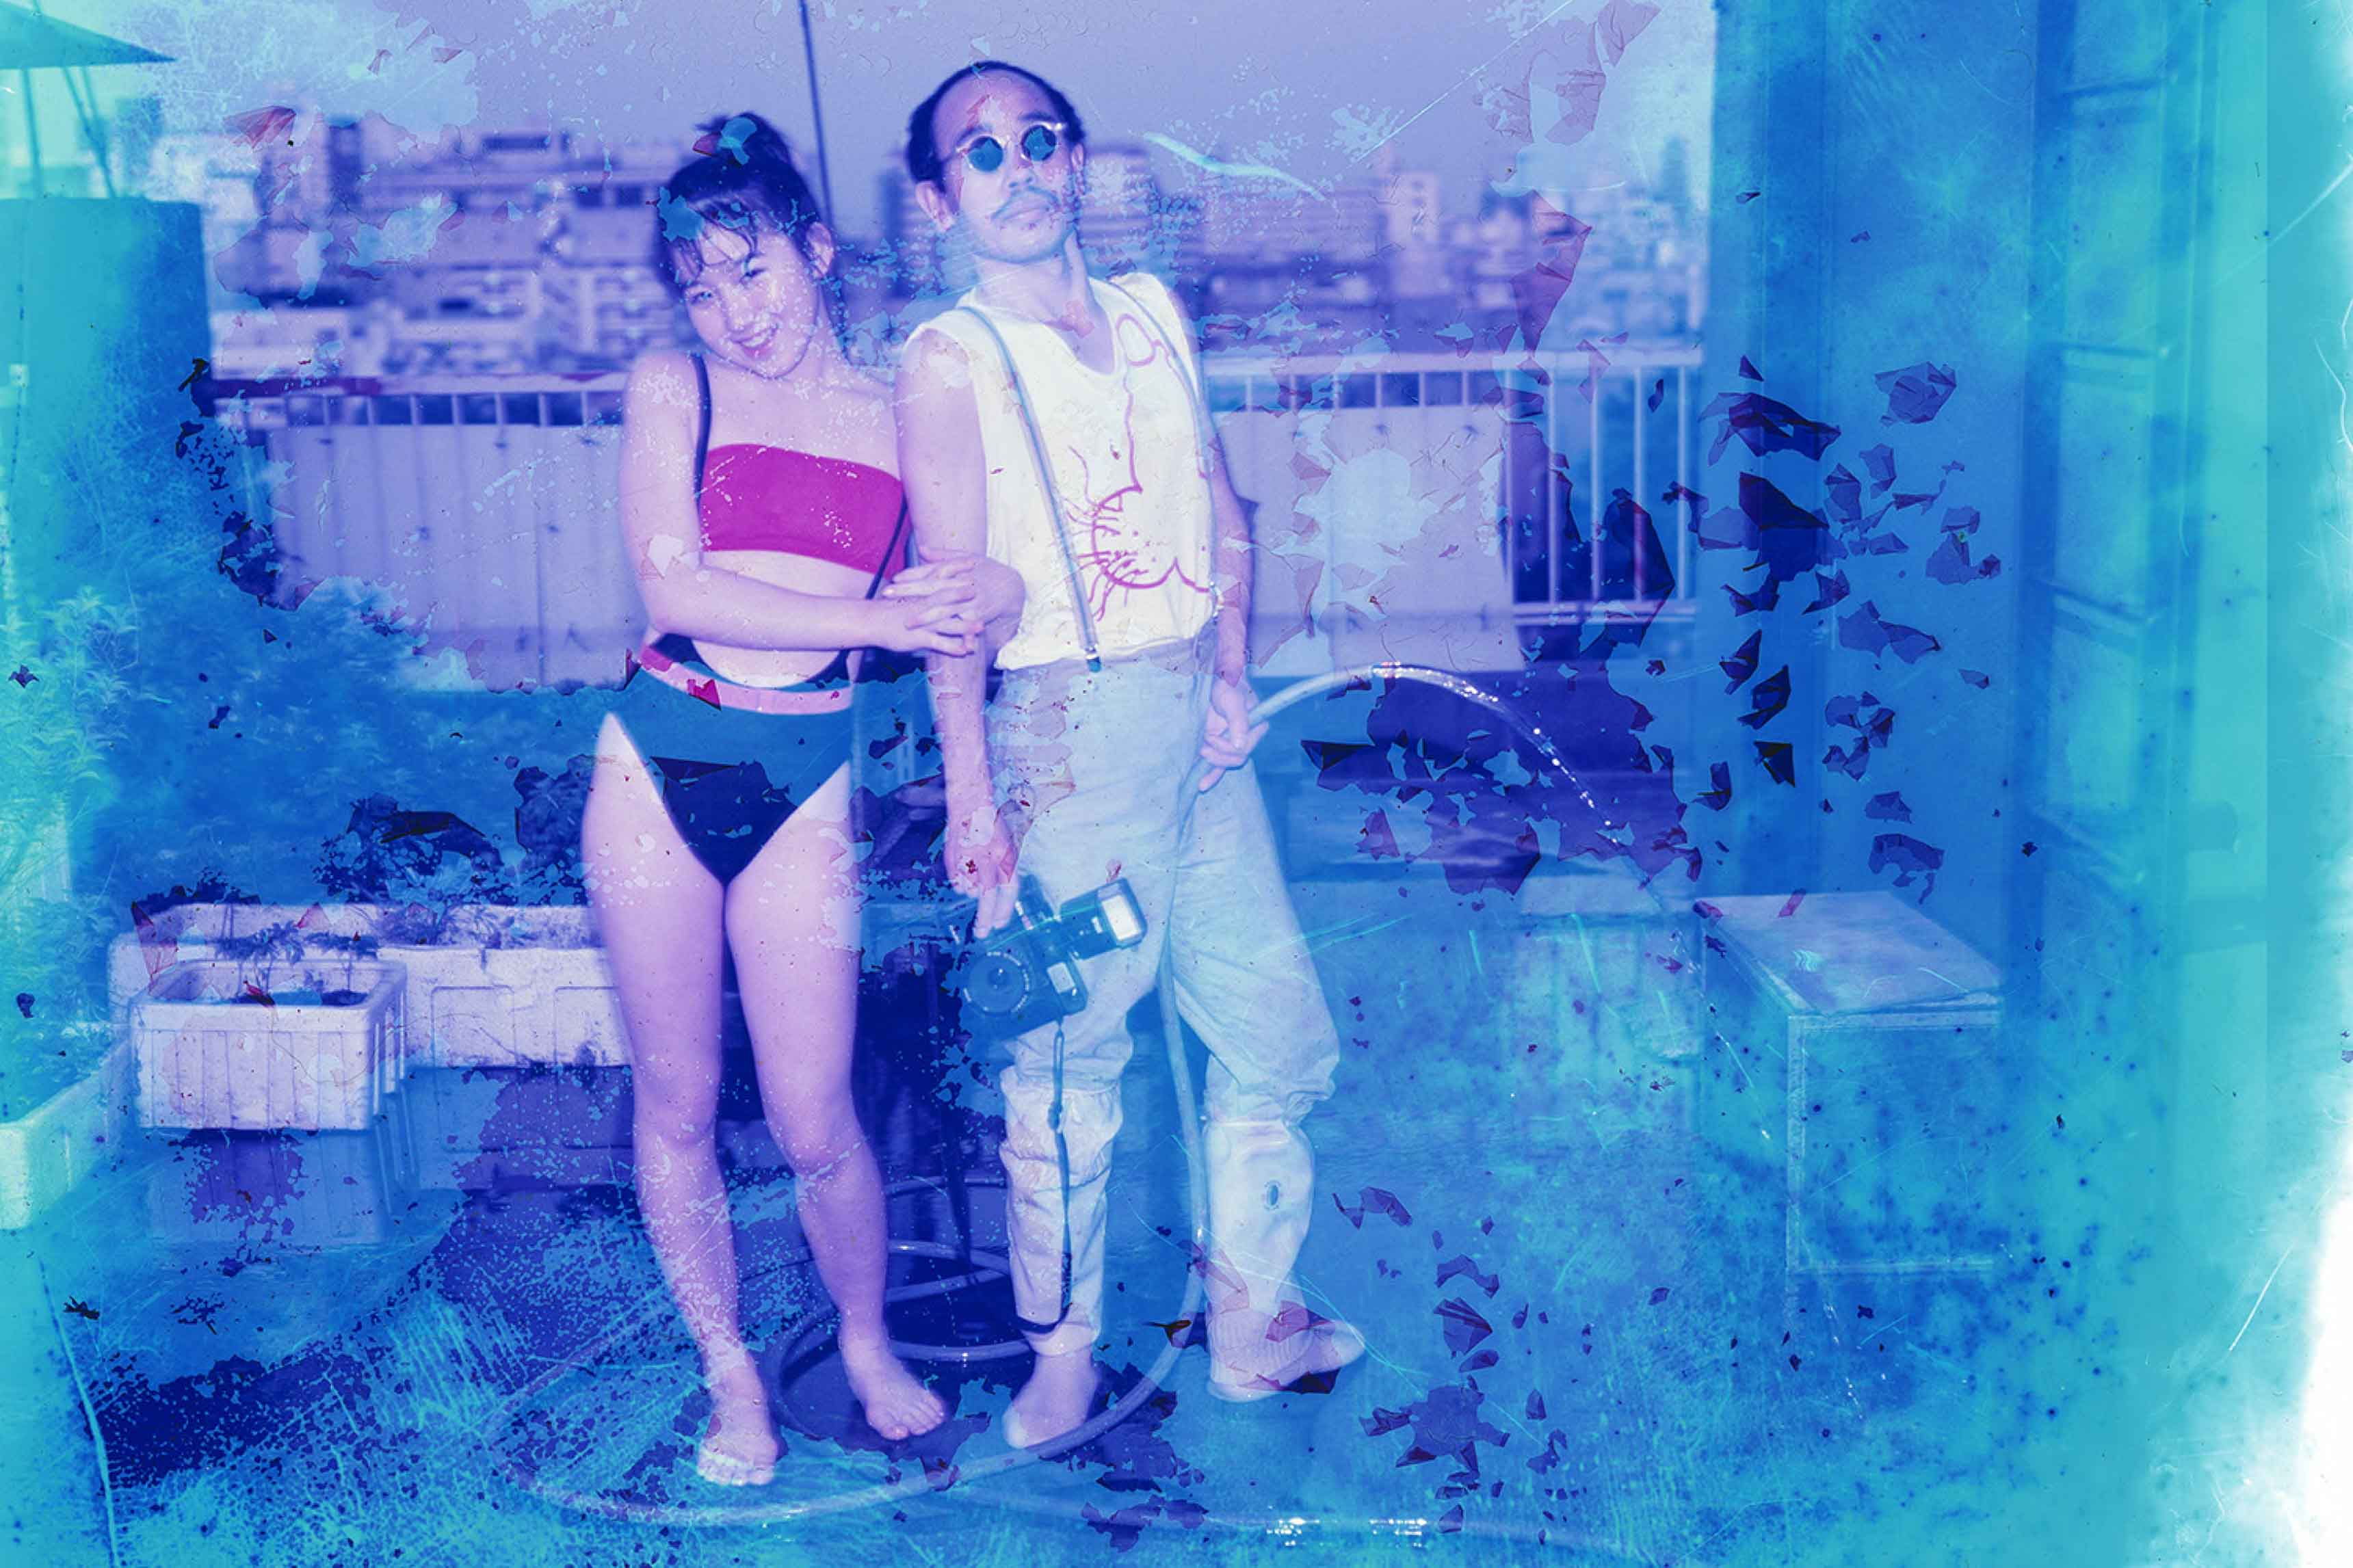 Blue Period and Last Summer, Nobuyoshi Araki, courtesy of Taka Ishii Gallery, Tokyo, mid '80s.